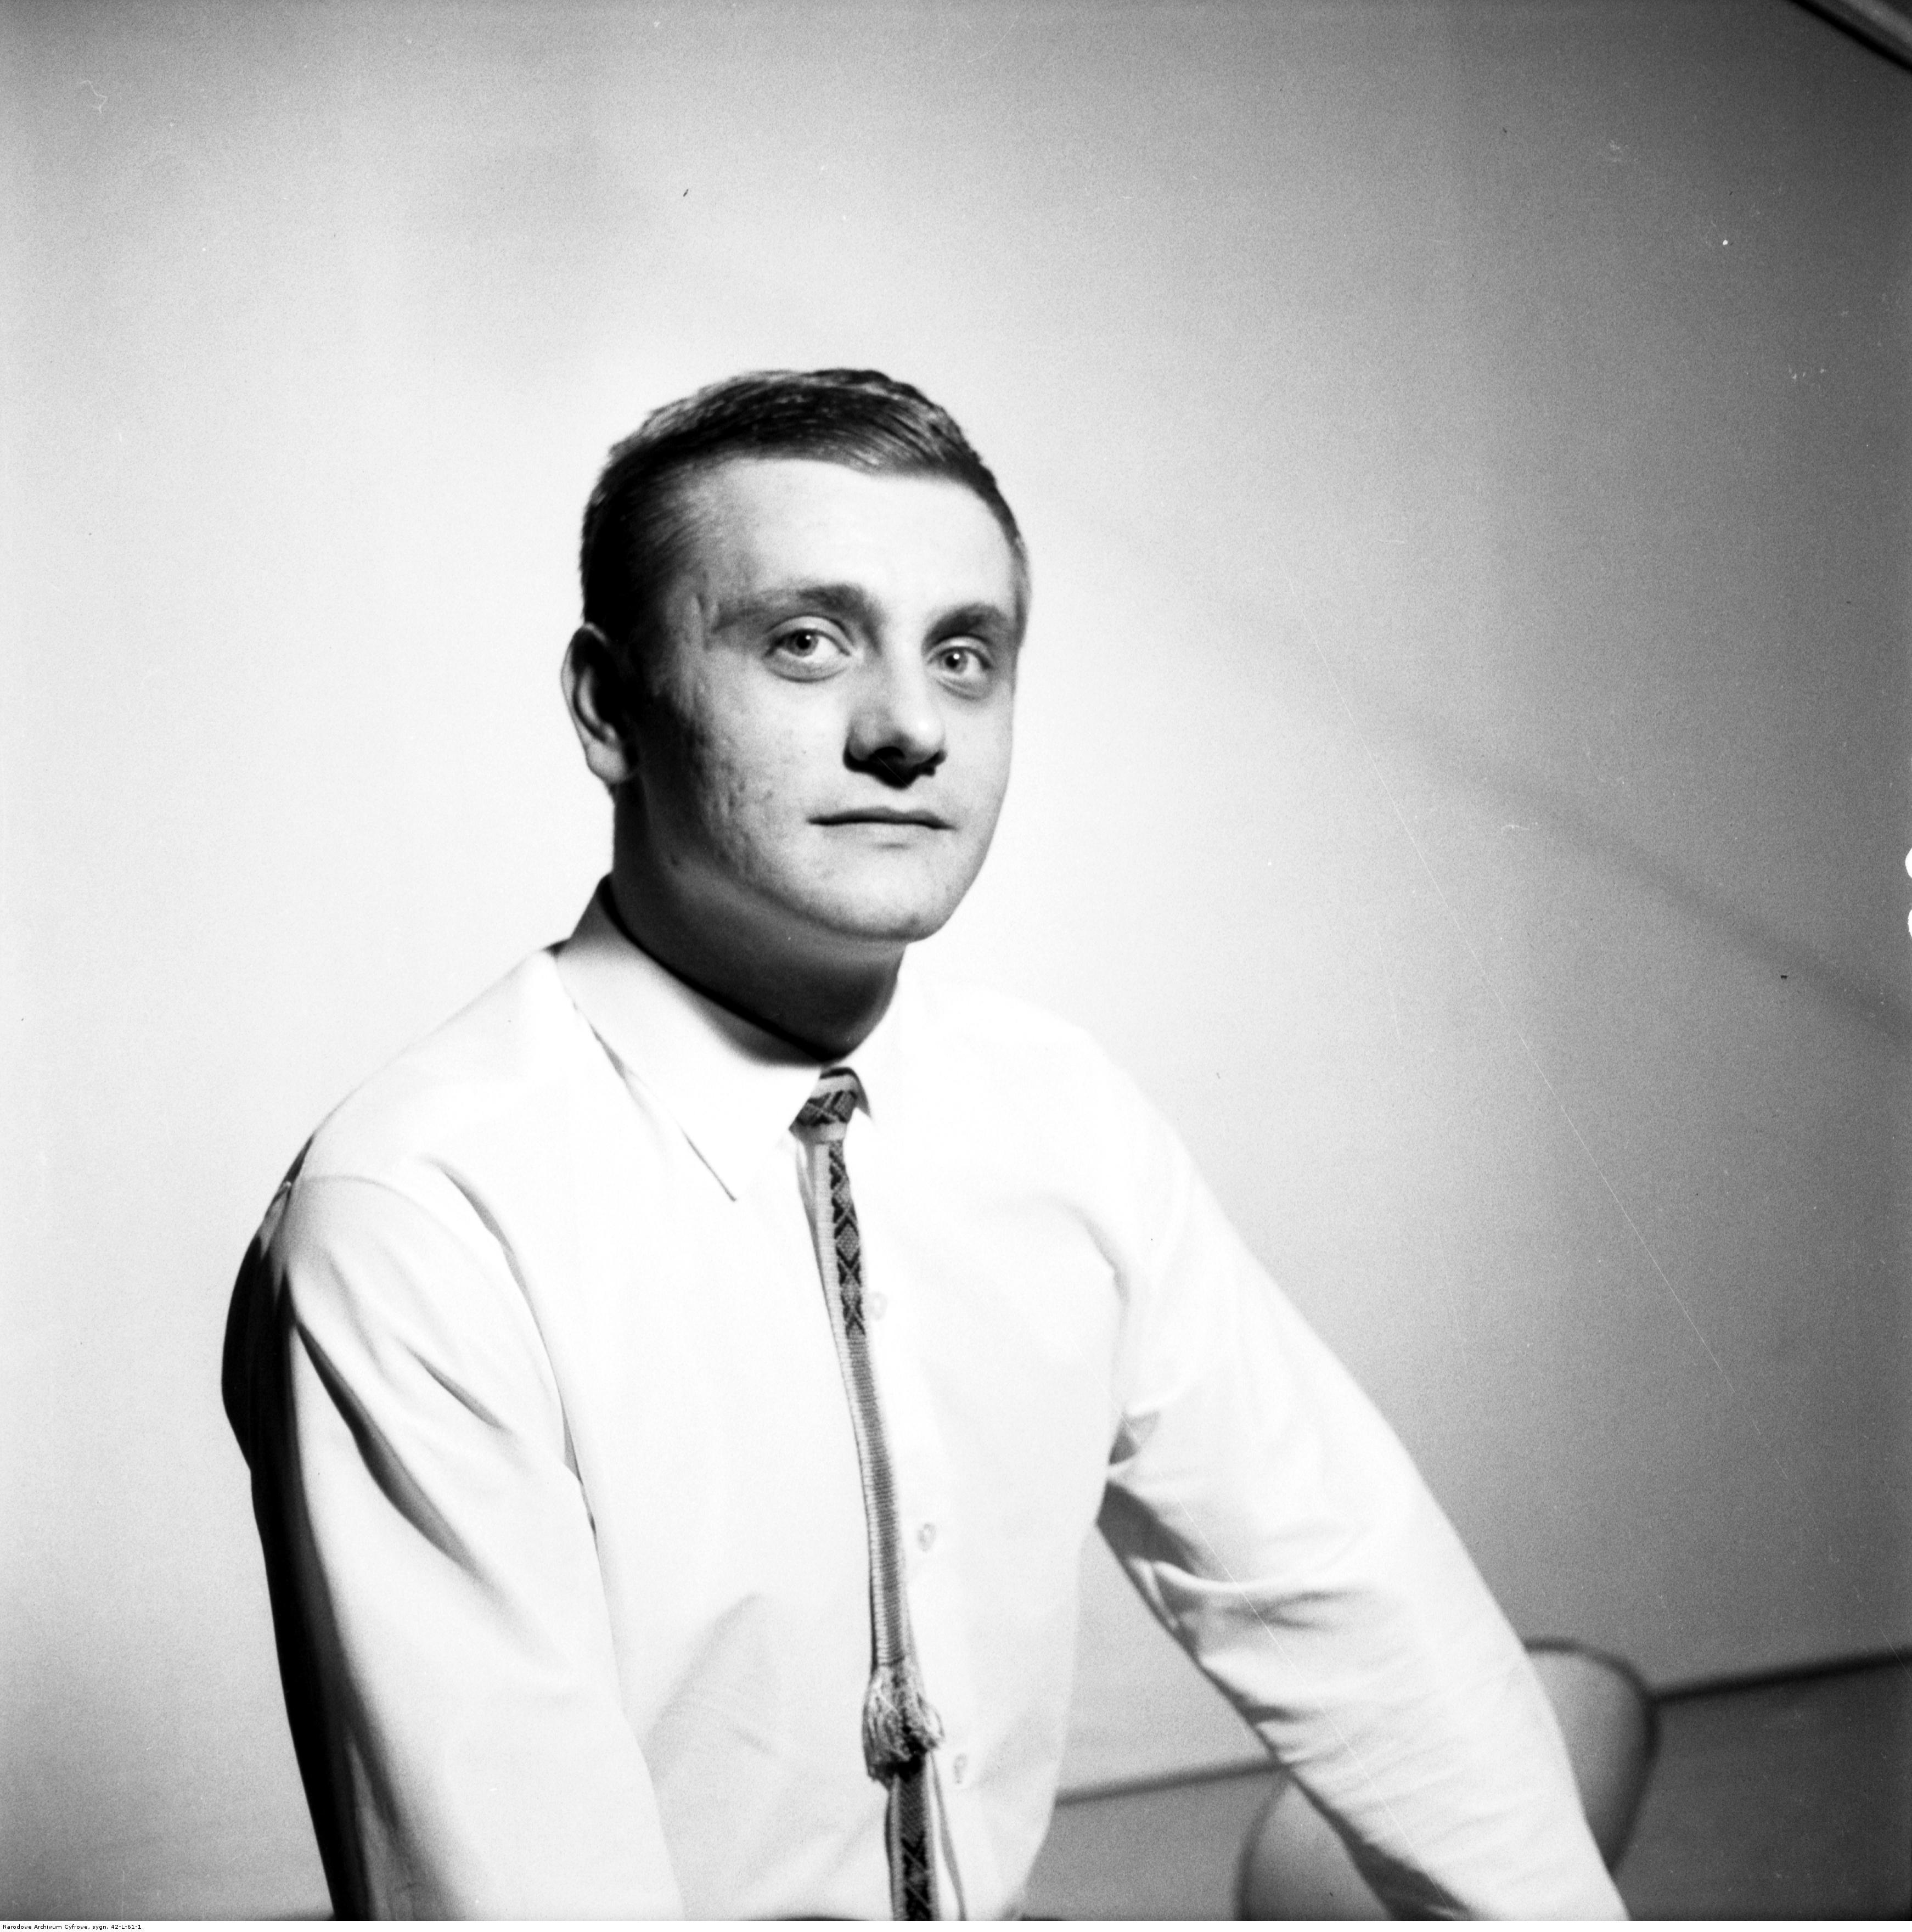 Janusz Bukowski Net Worth